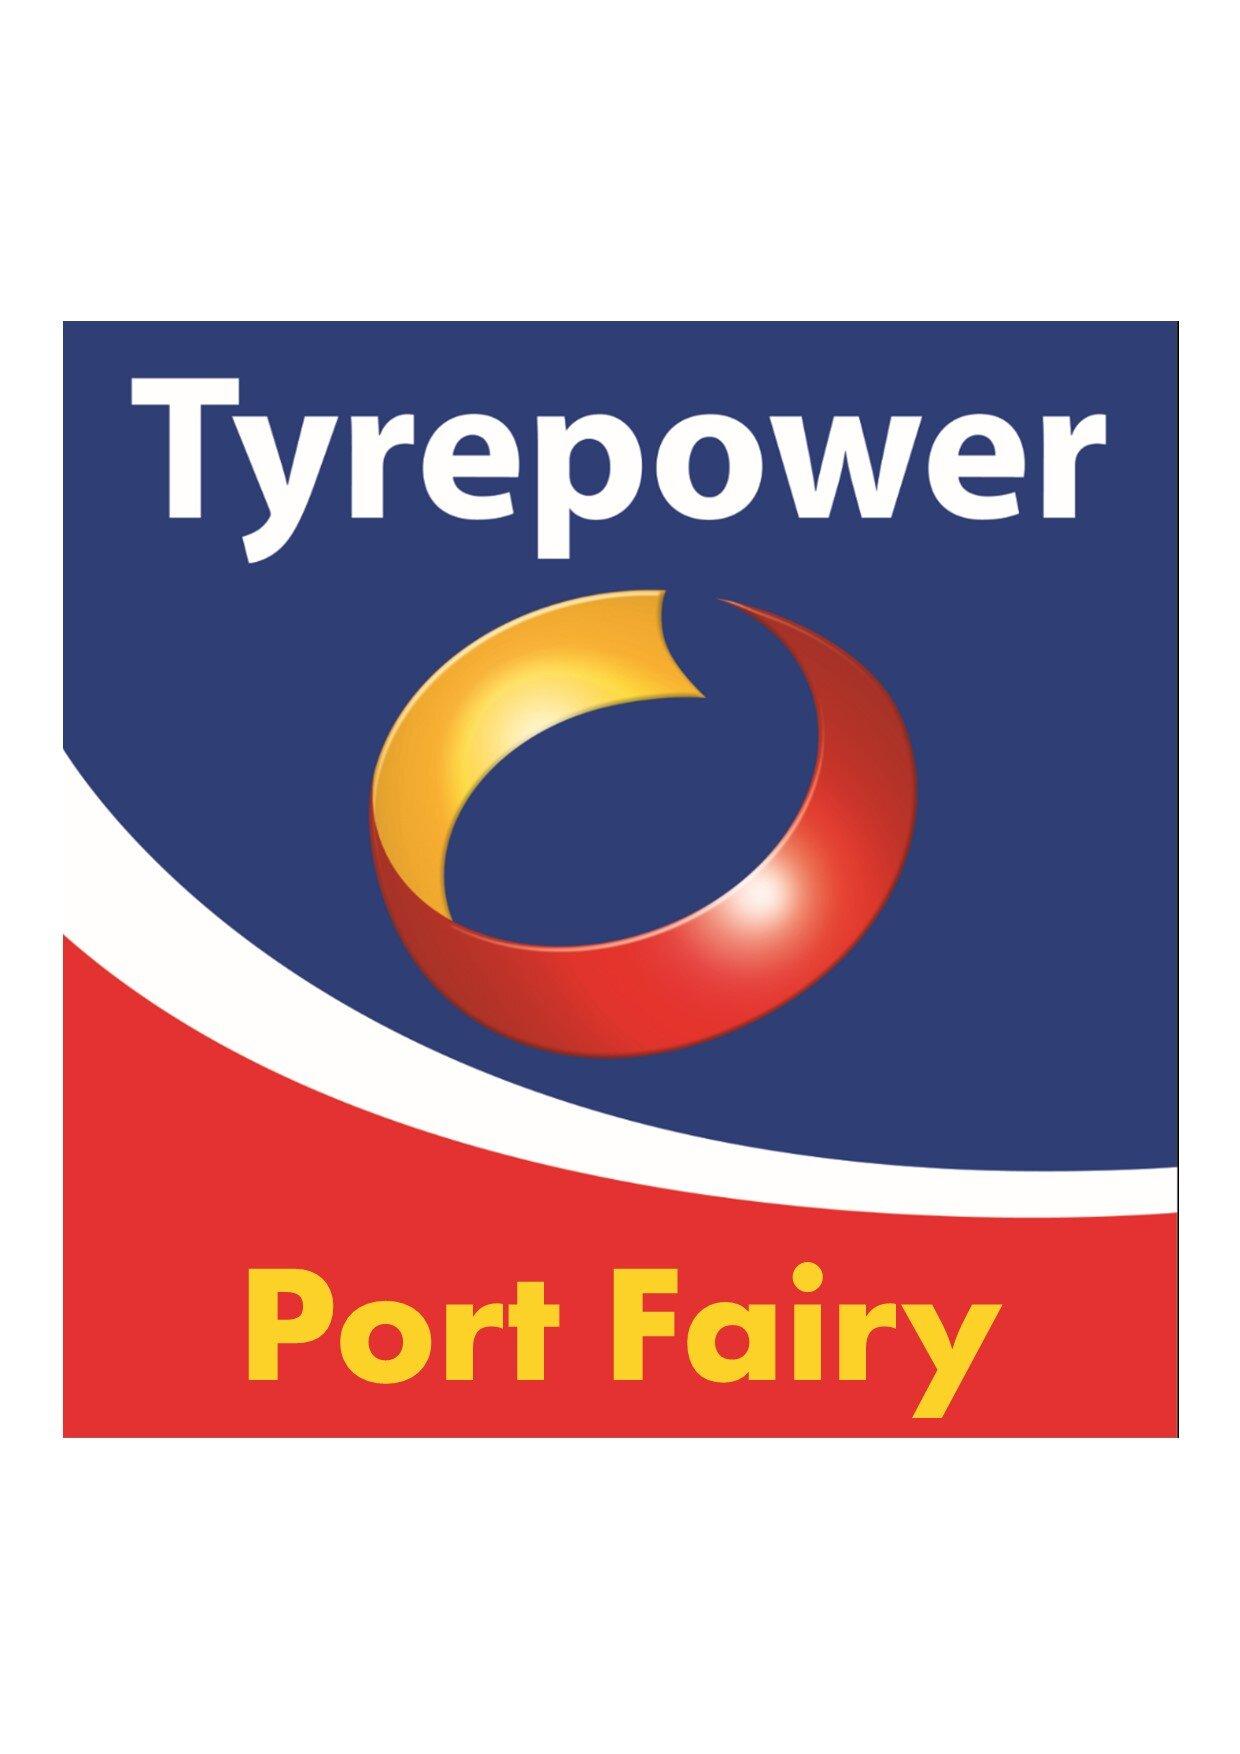 Tyrepower Port Fairy